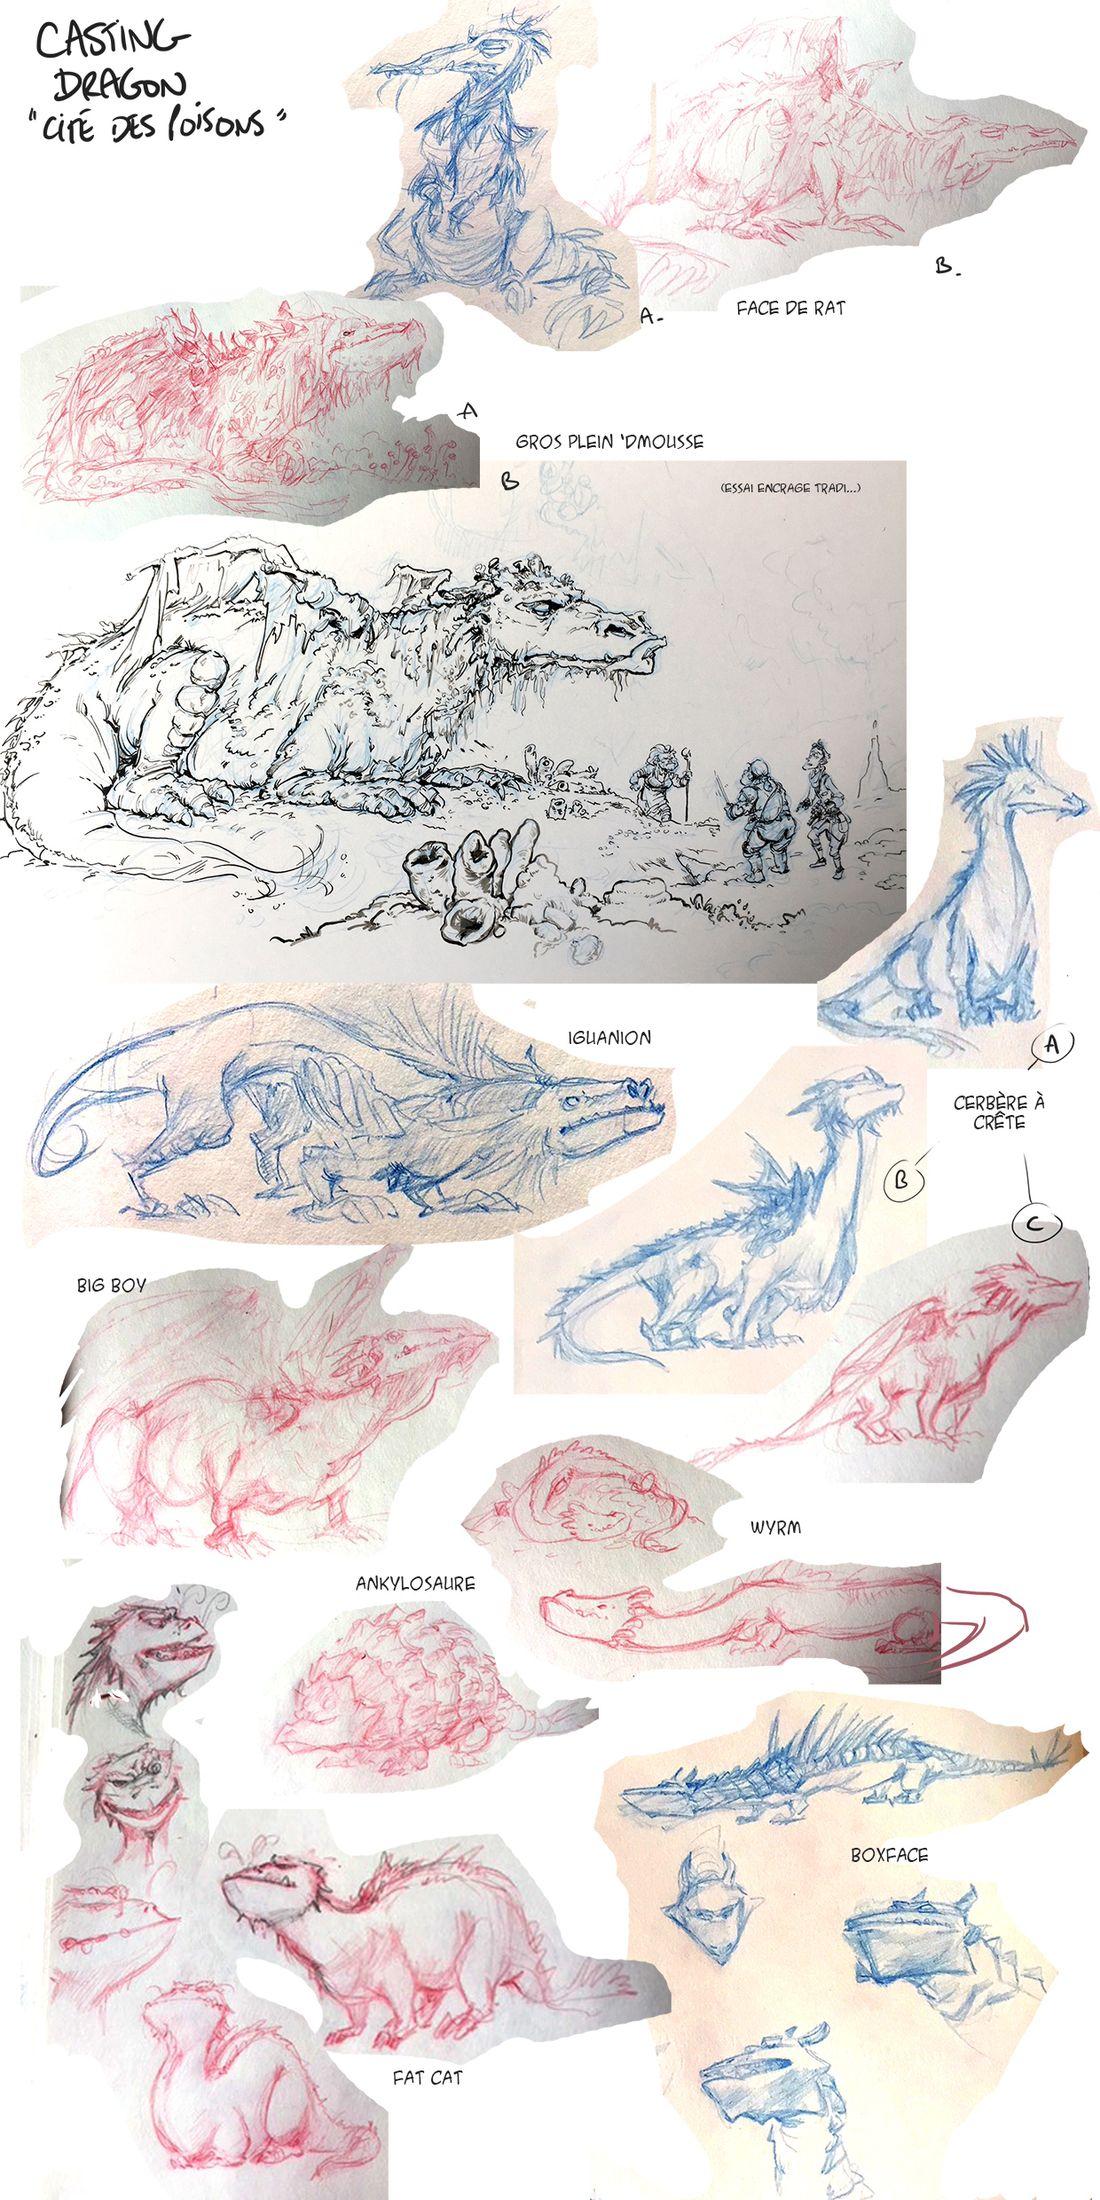 Dragon & Poisons, le casting du Dragon © Rebecca Morse